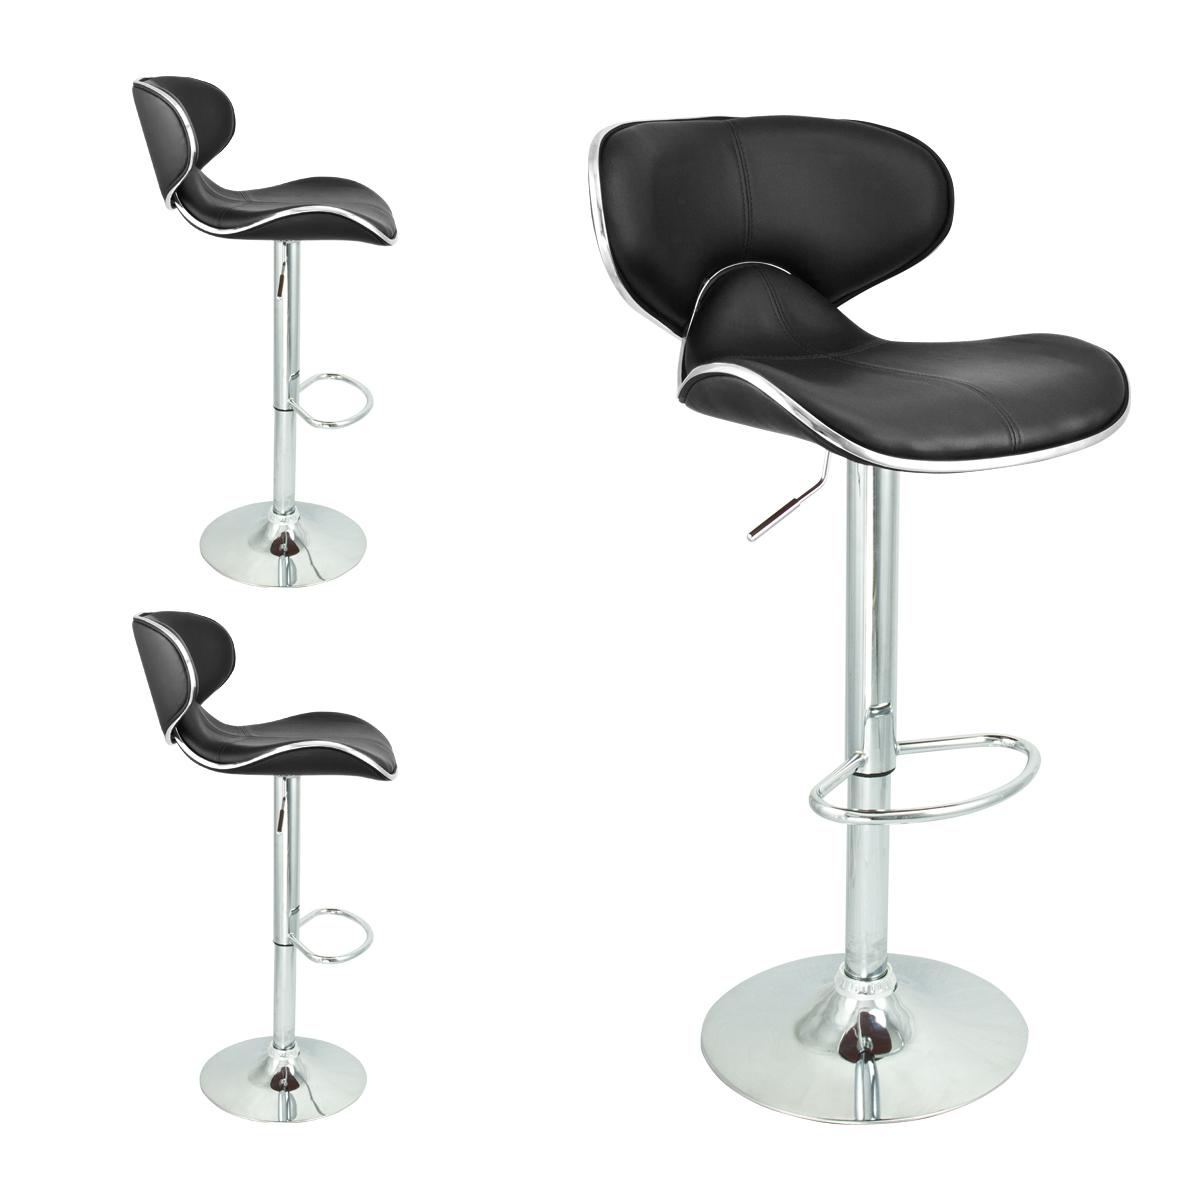 Elegant Kitchen Bar Stools: Modern Black Barstool 2 Swivel Elegant PU Leather